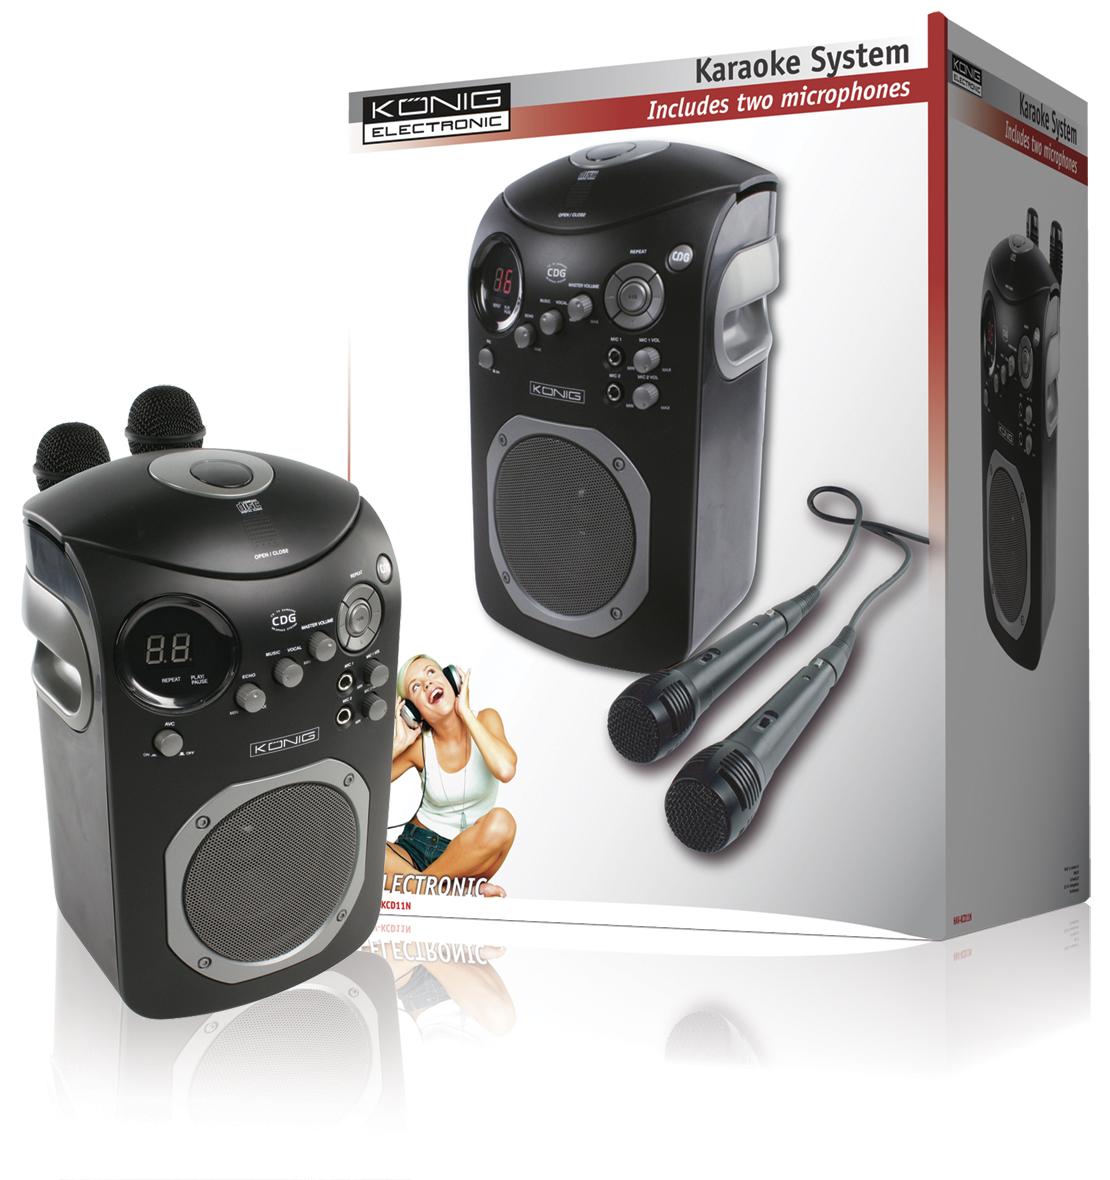 kit de karaoke con reproductor de cd djmania. Black Bedroom Furniture Sets. Home Design Ideas